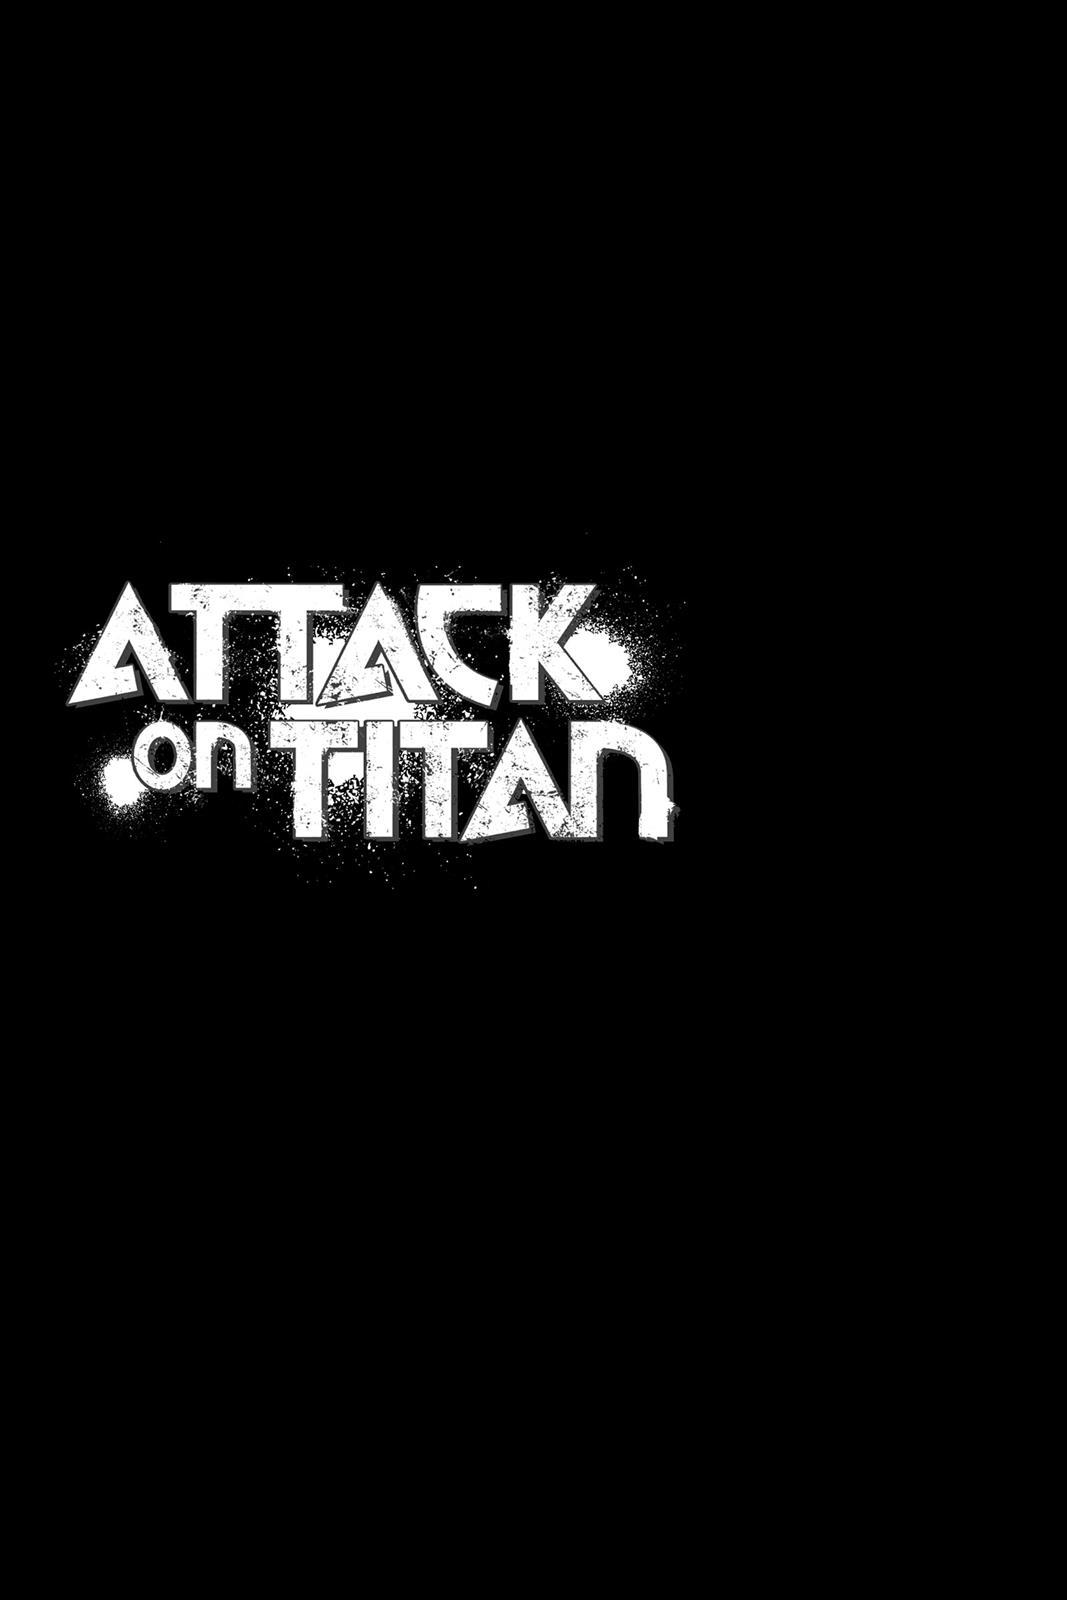 Attack On Titan, Episode 101 image 041